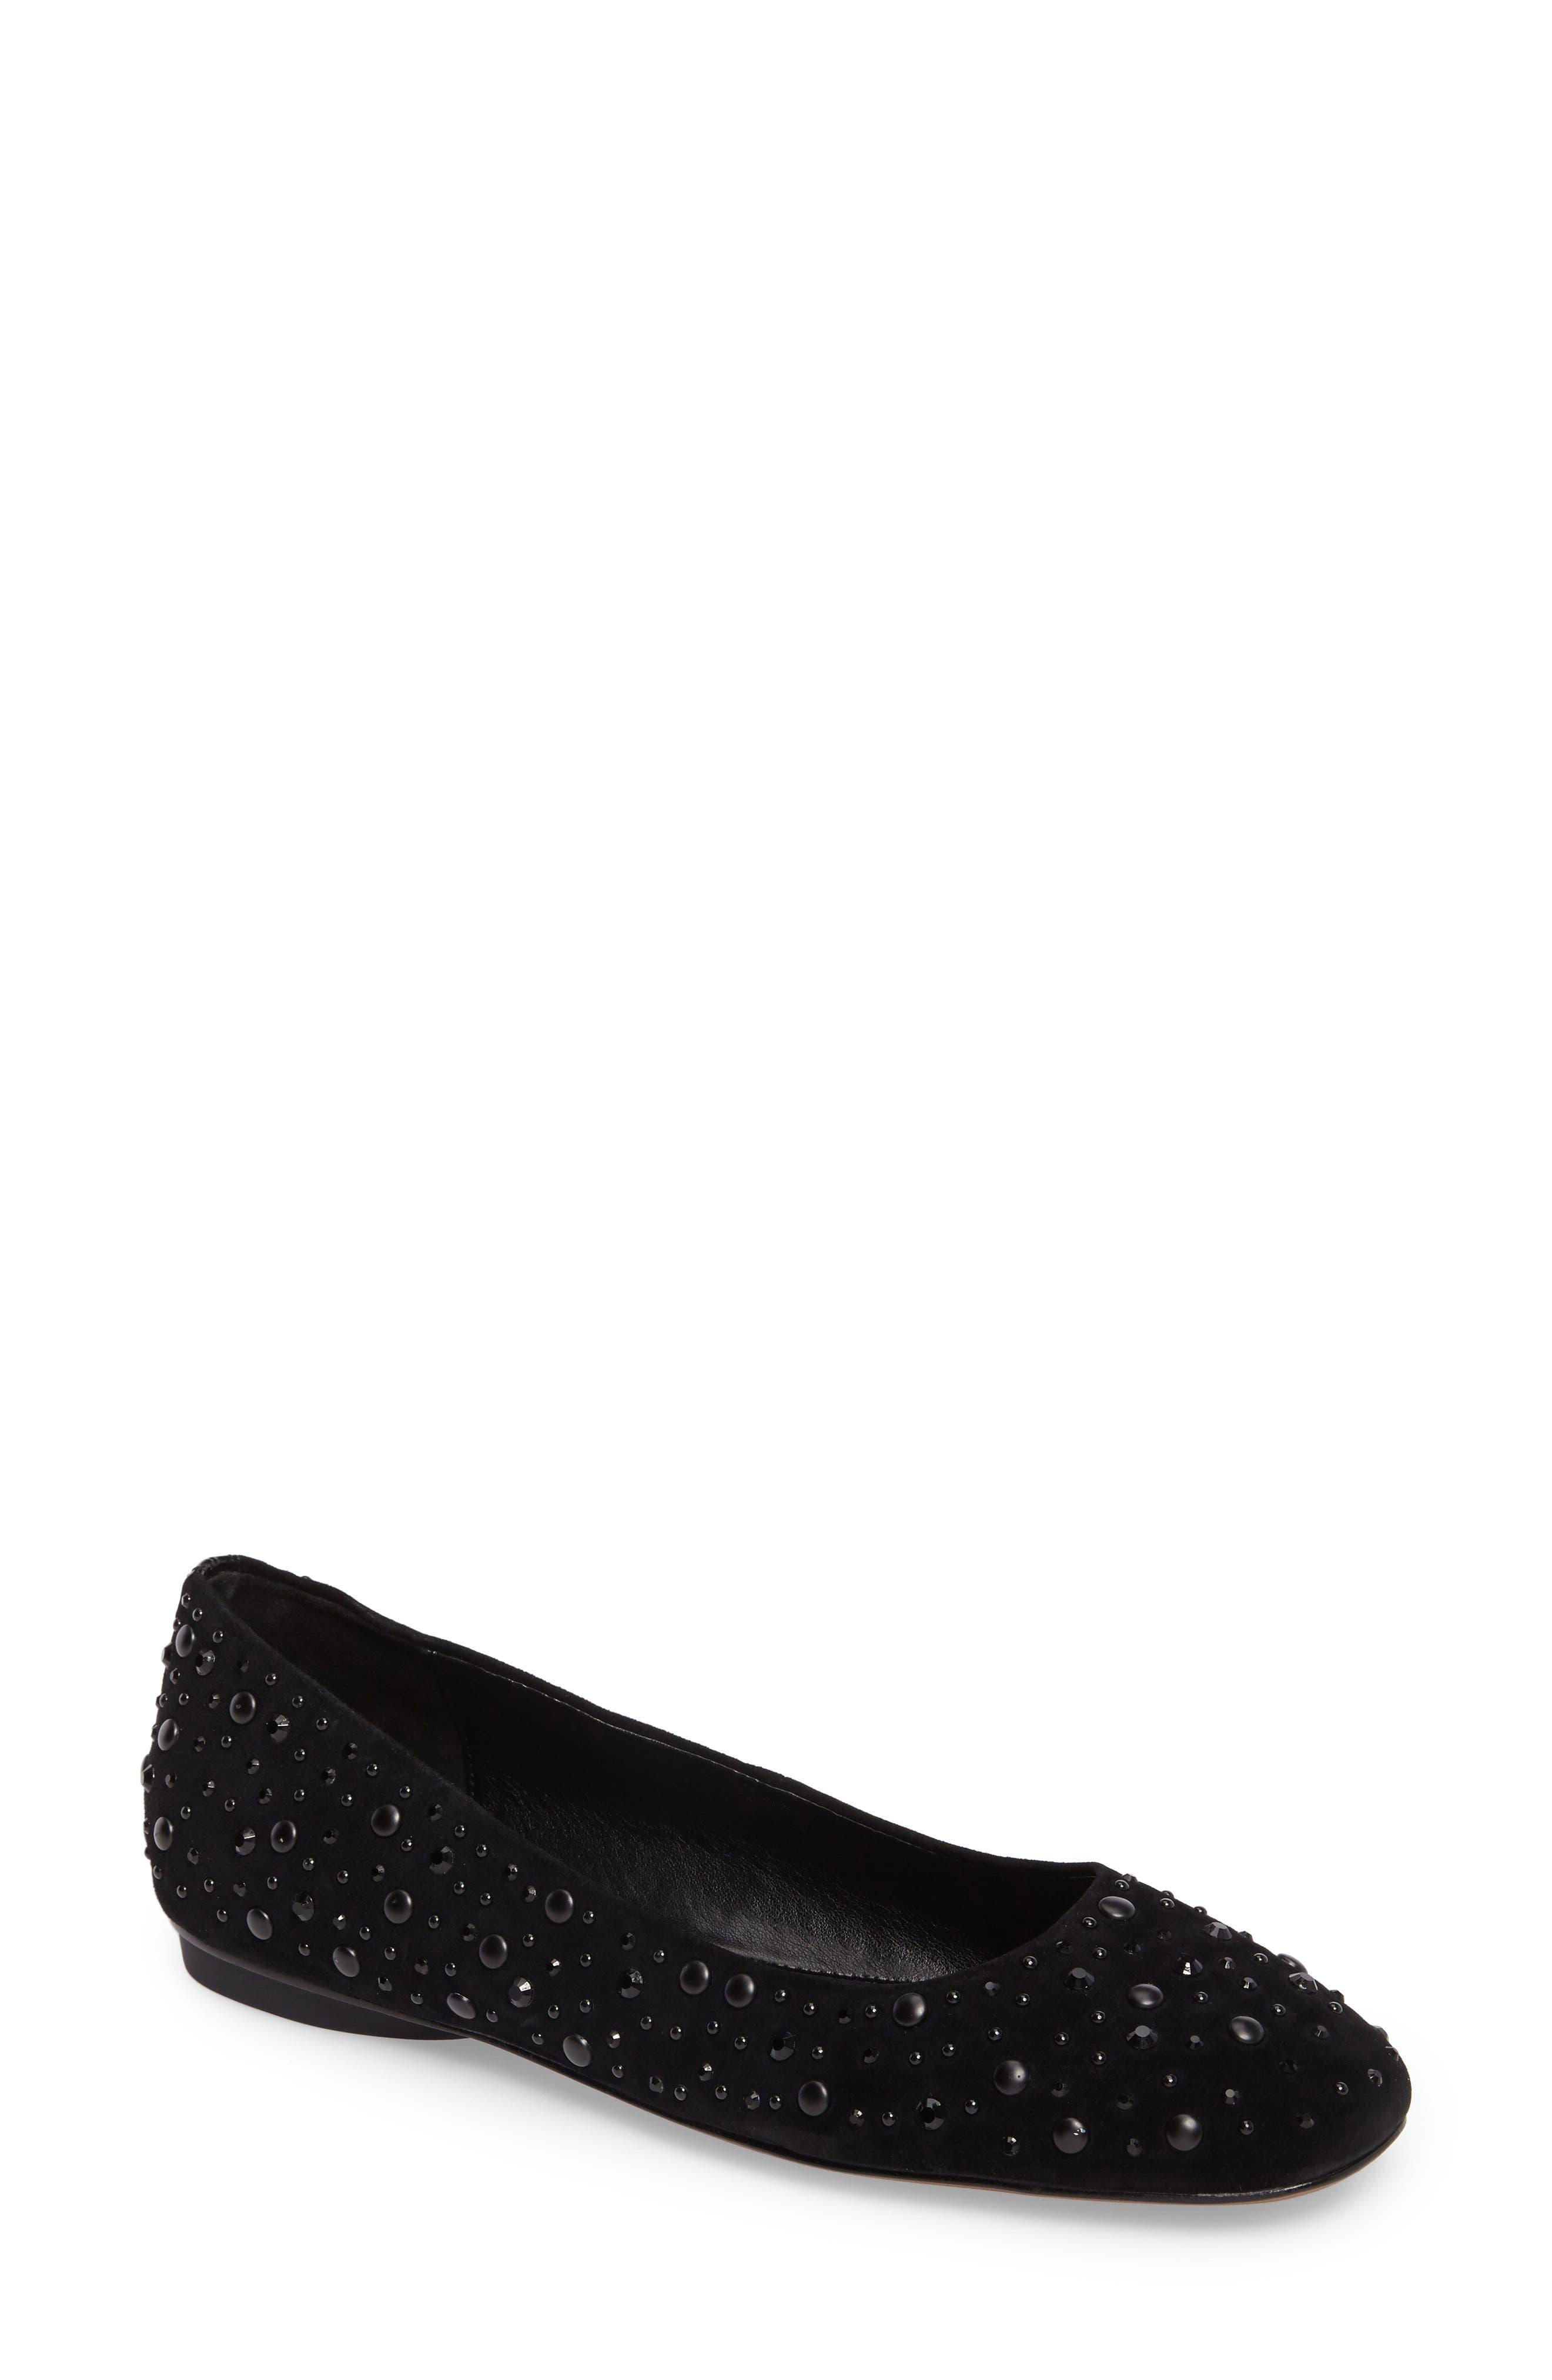 Dora Skimmer Flat,                             Main thumbnail 1, color,                             Black Leather